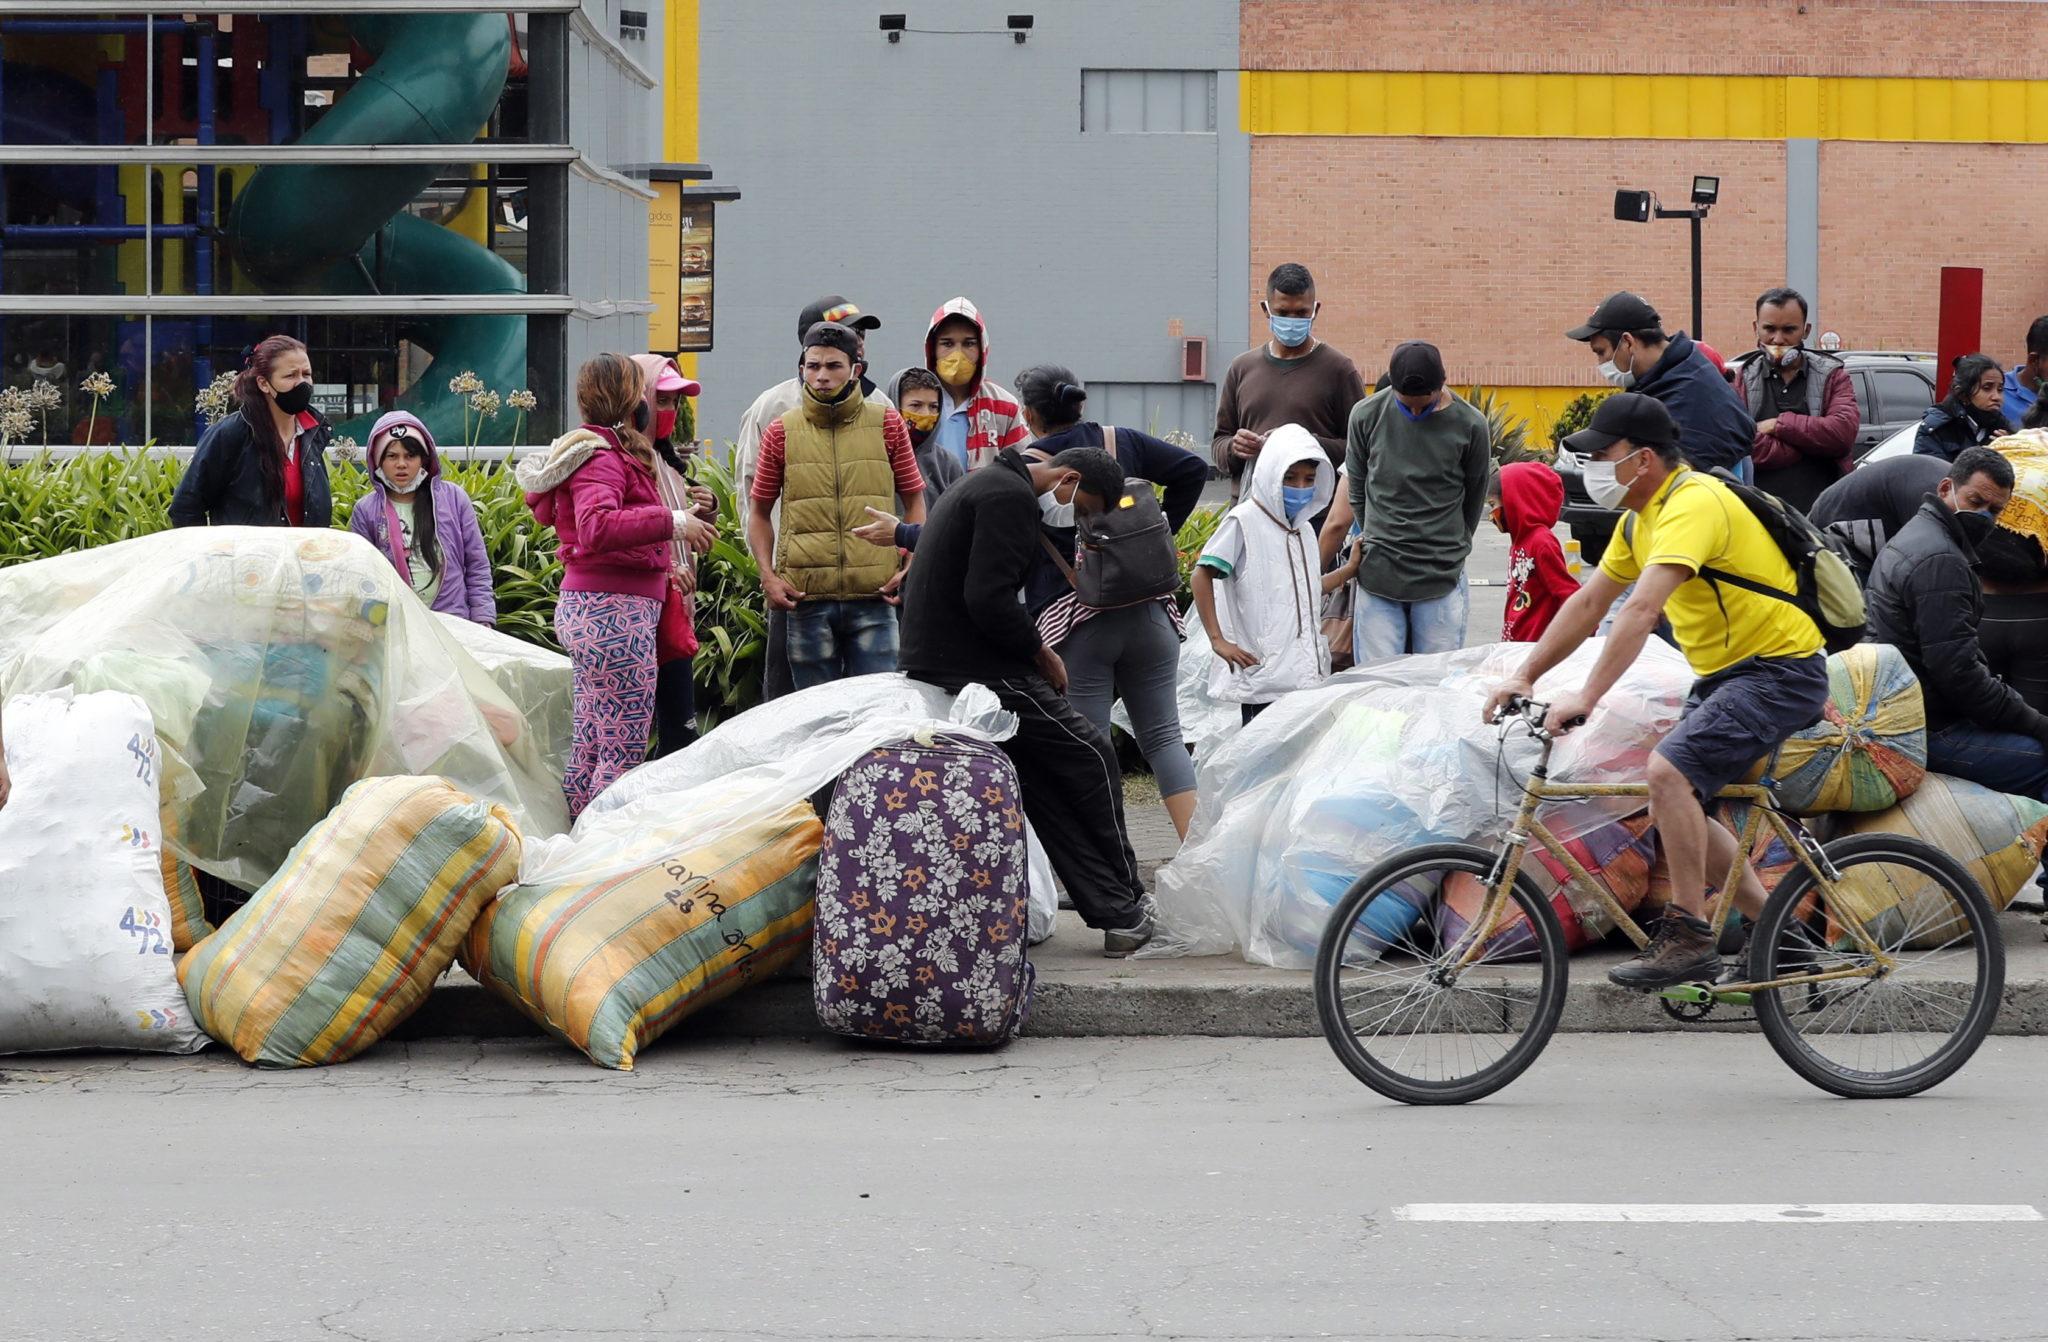 Migranci w Wenezueli, Colombia, ffot. EPA/Mauricio Duenas Castañeda